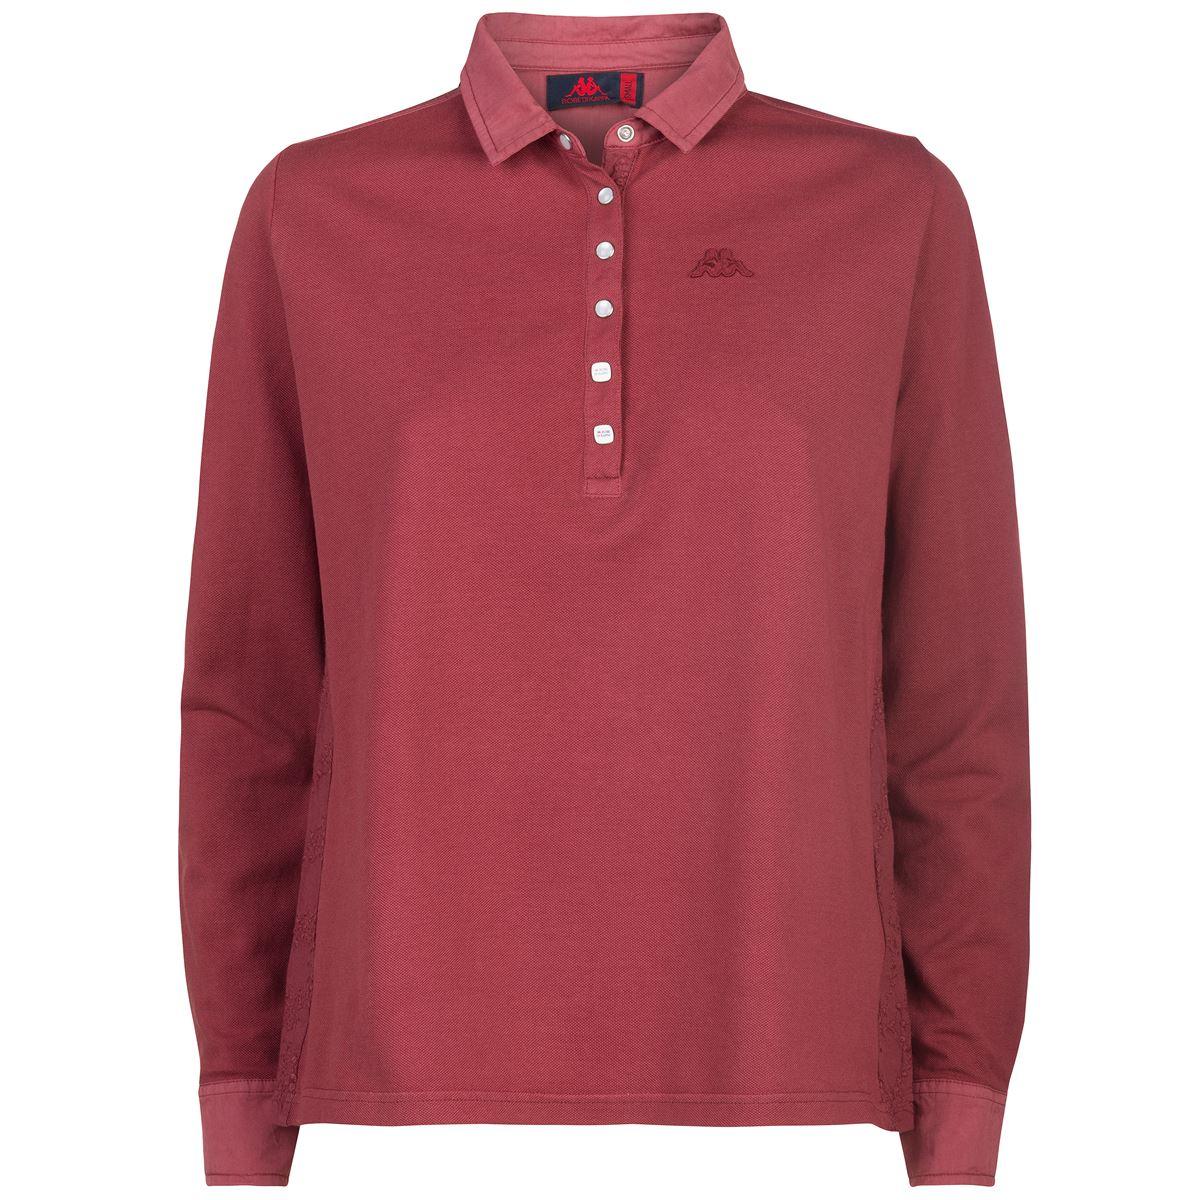 Robe di Kappa Polo Shirts donna-601NPJ0